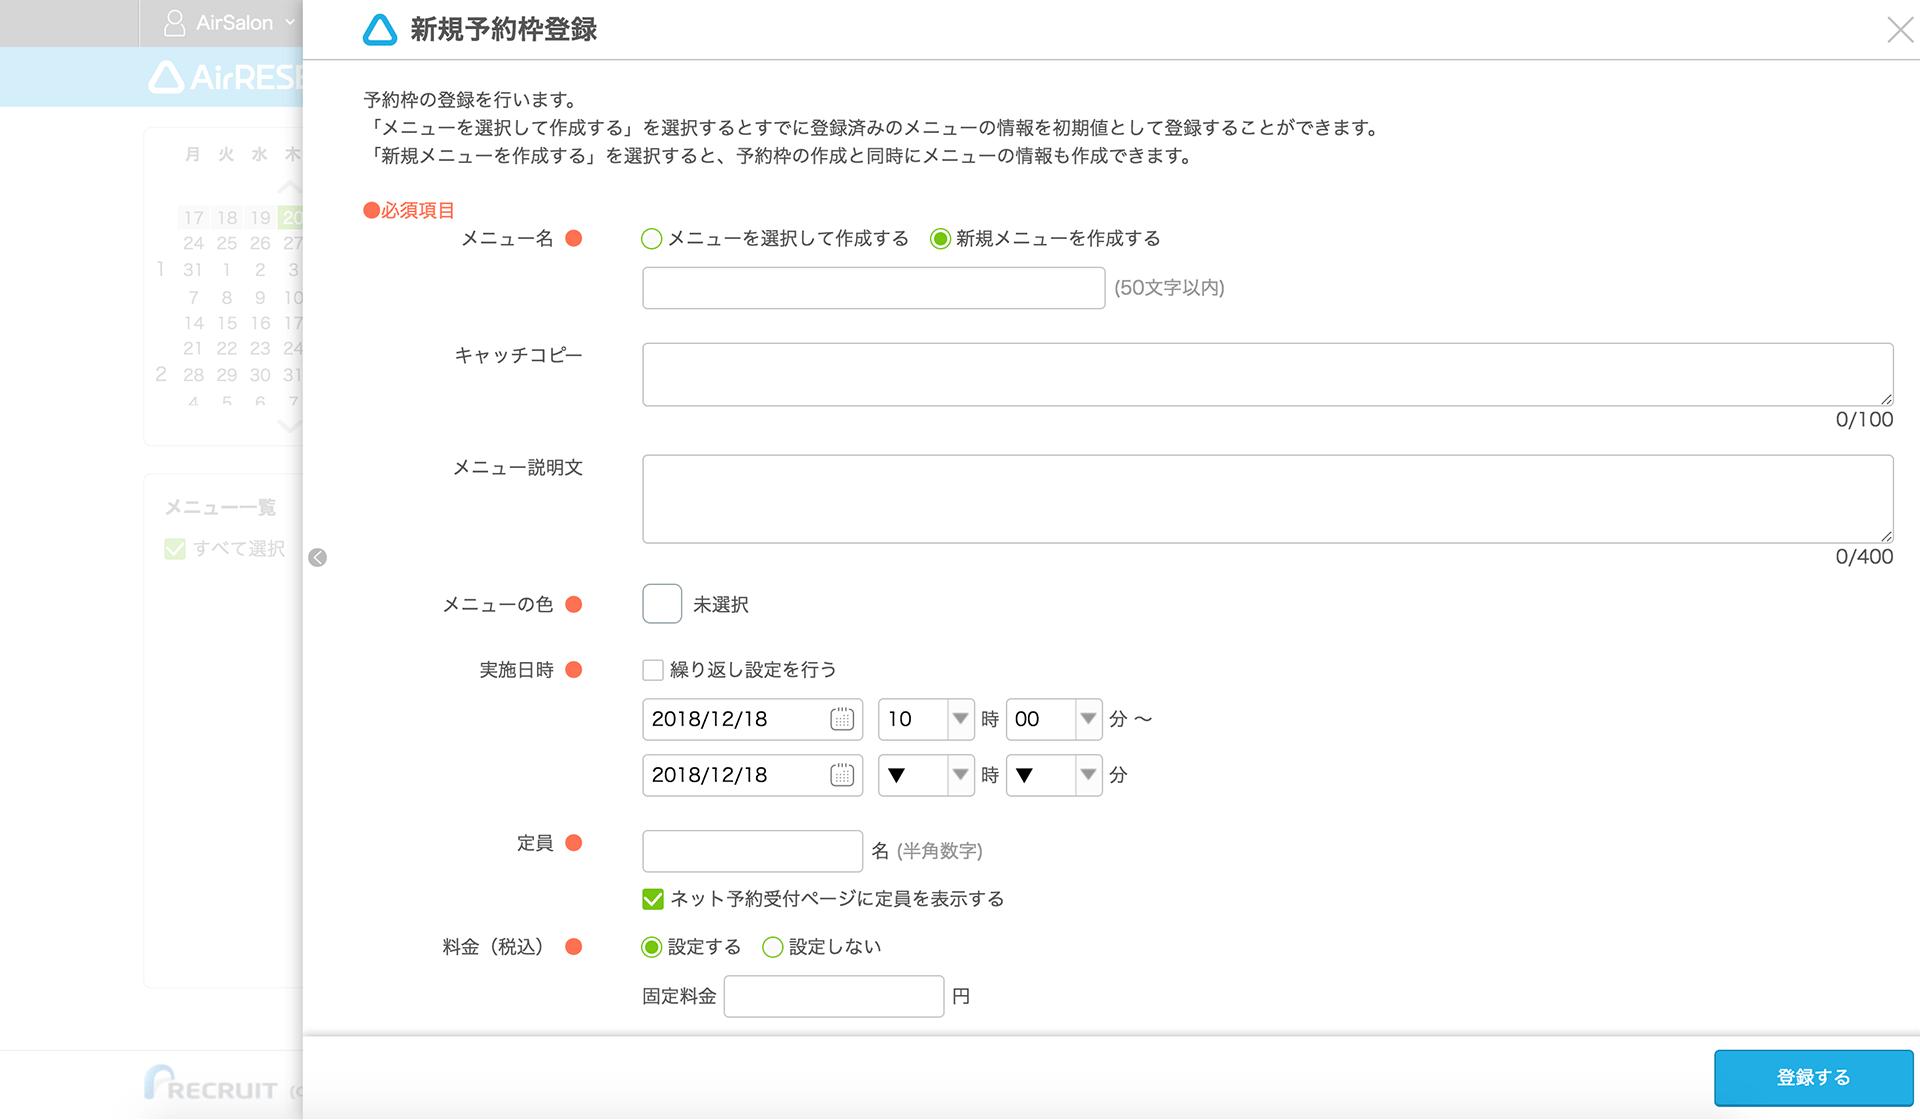 Airリザーブ 予約カレンダー(事前設定タイプ)